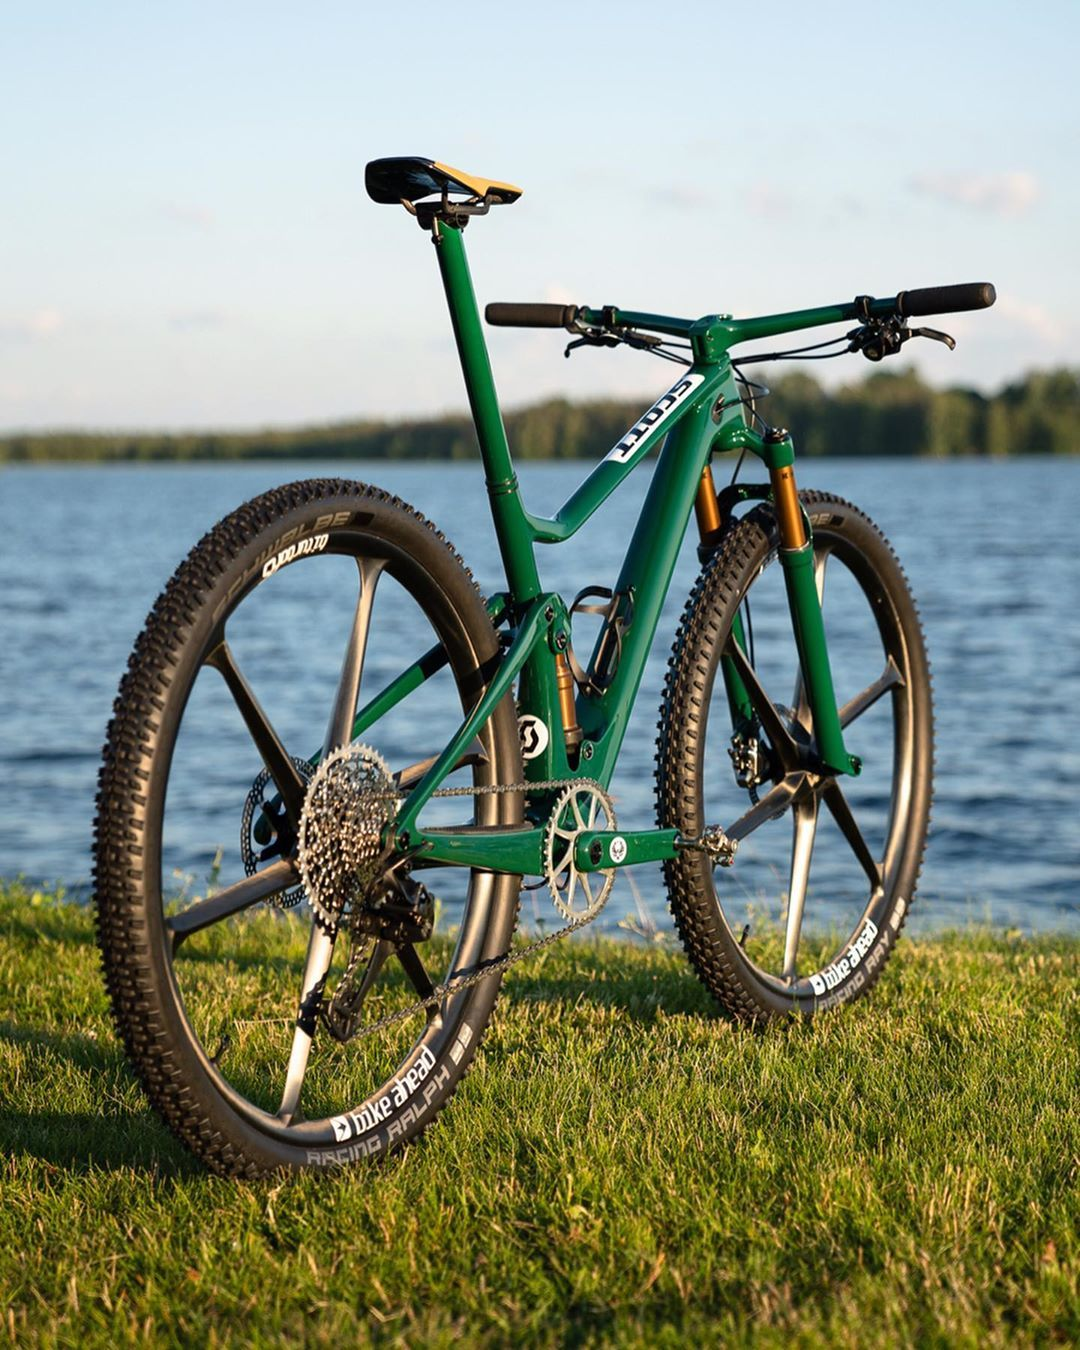 A Imagem Pode Conter Bicicleta Atividades Ao Ar Livre E Natureza Bicycle Mountain Bike British Racing Green Cool Bicycles